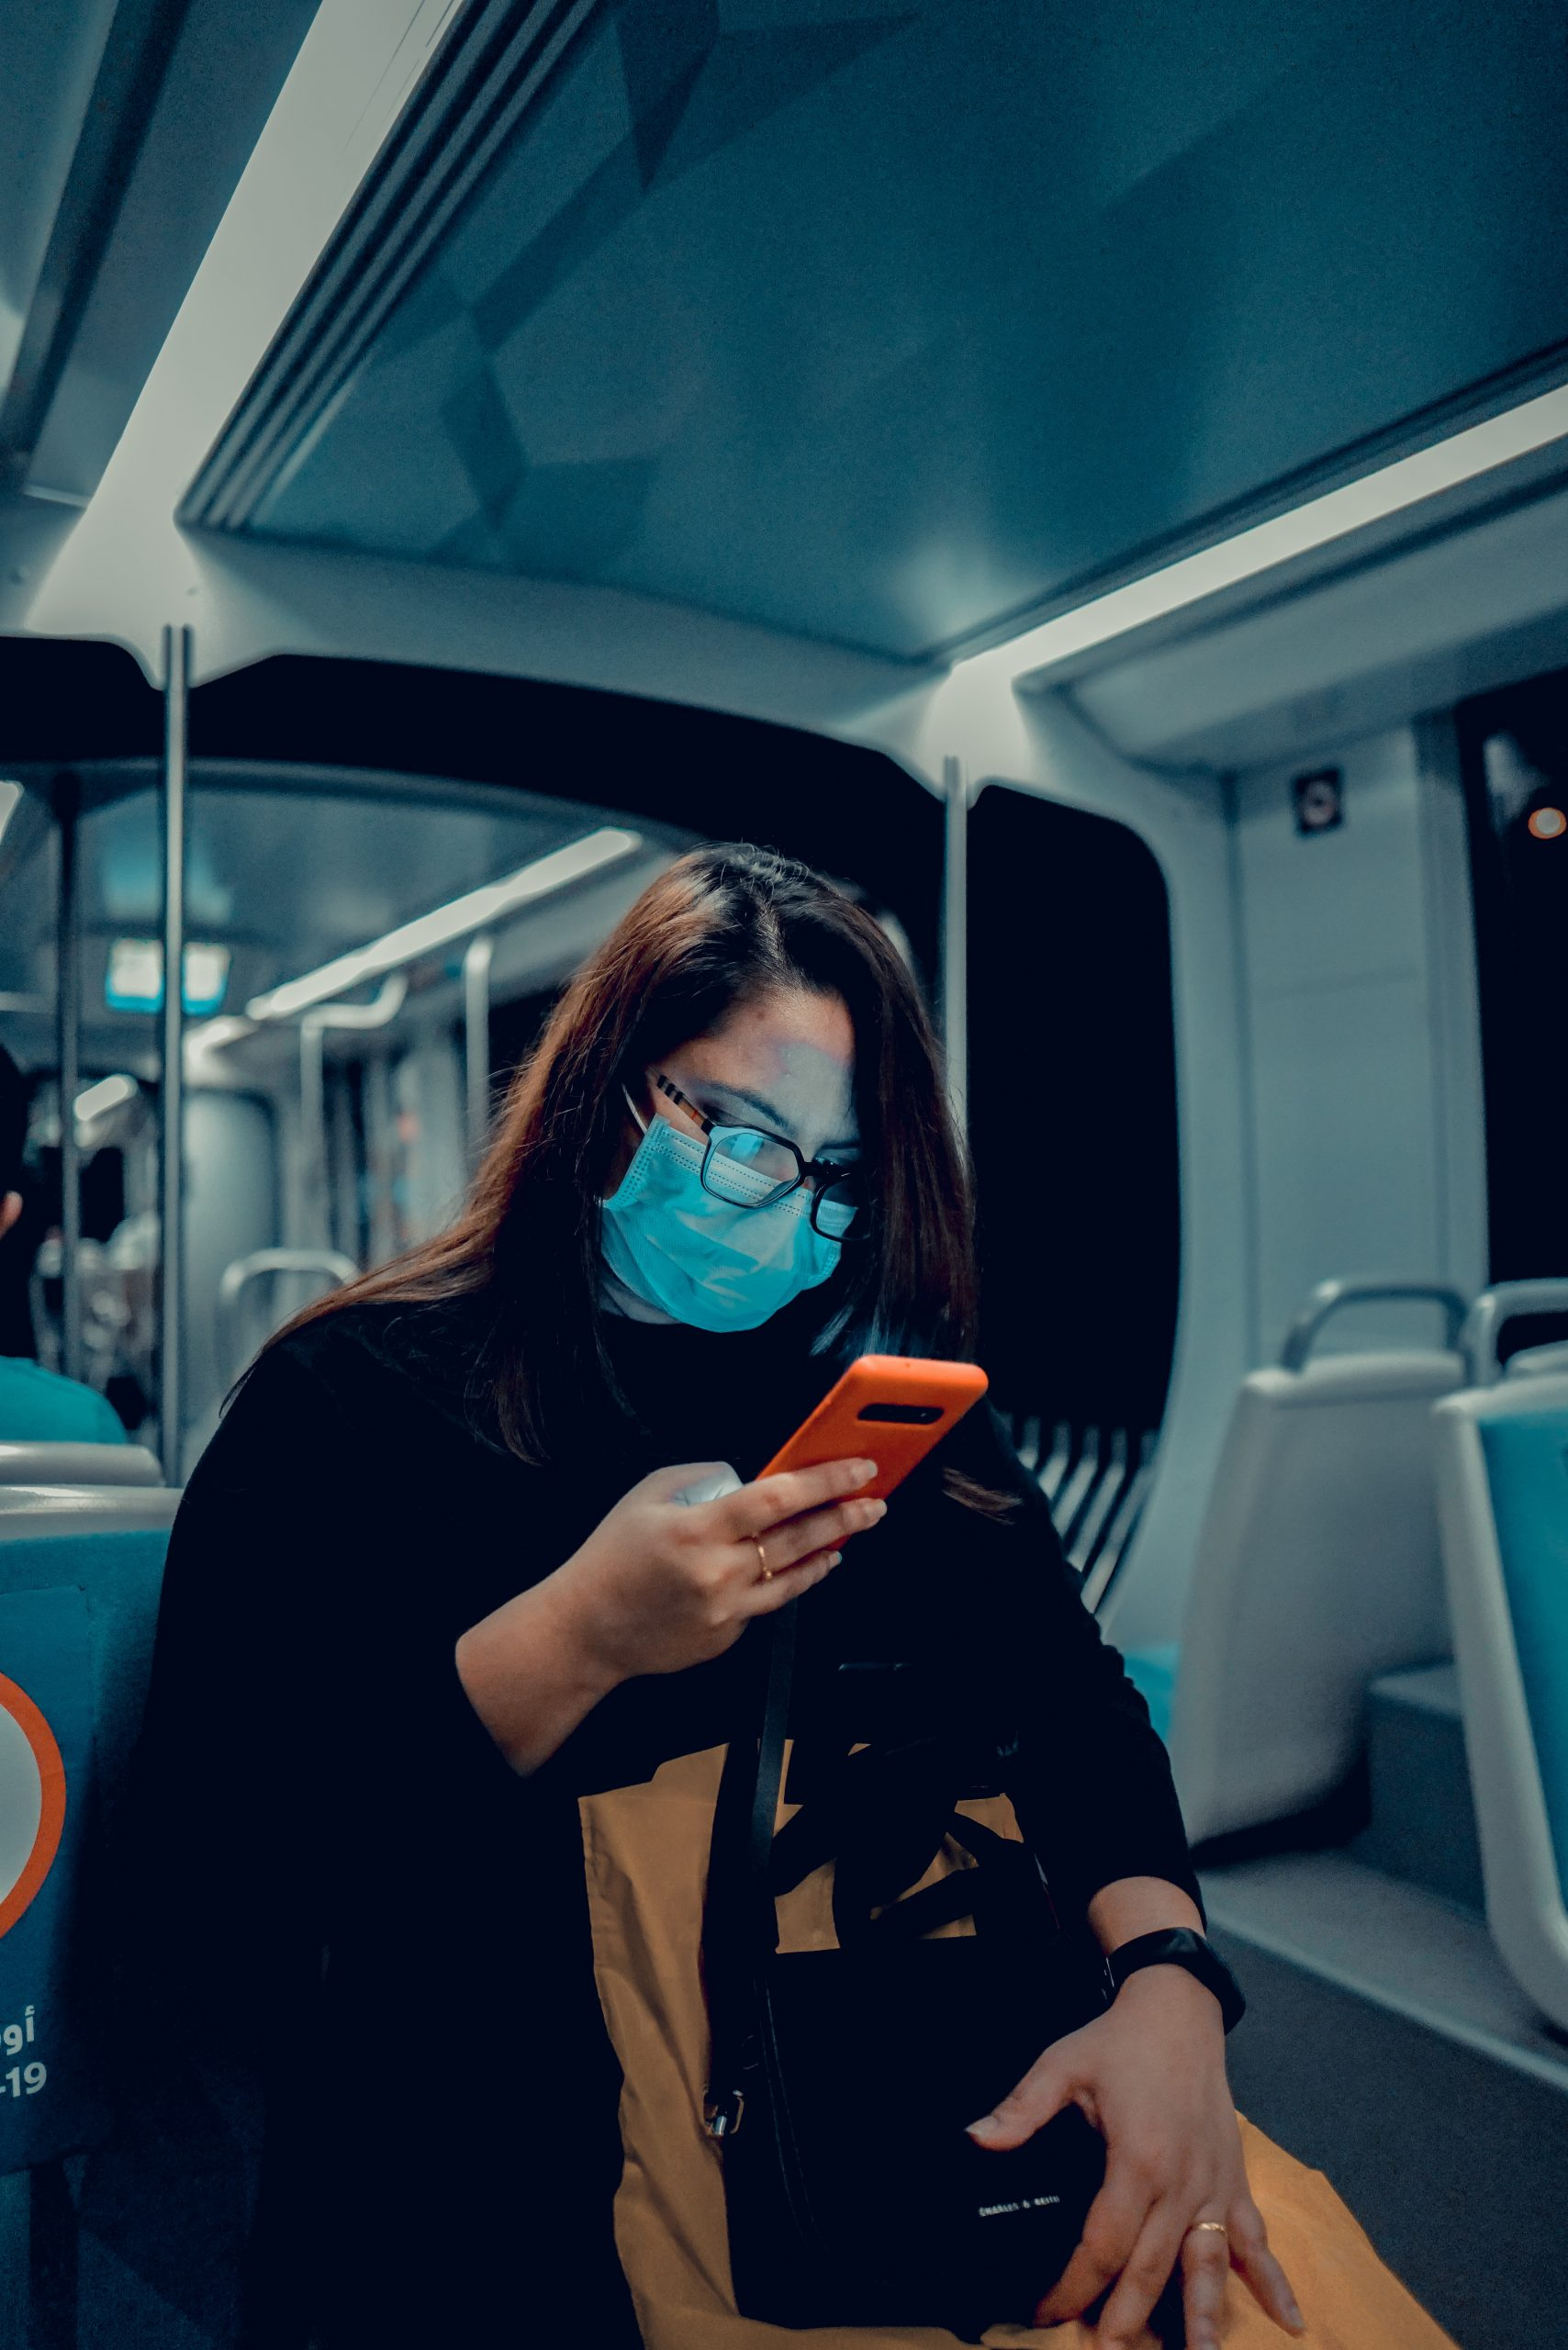 mobile user wearing mask